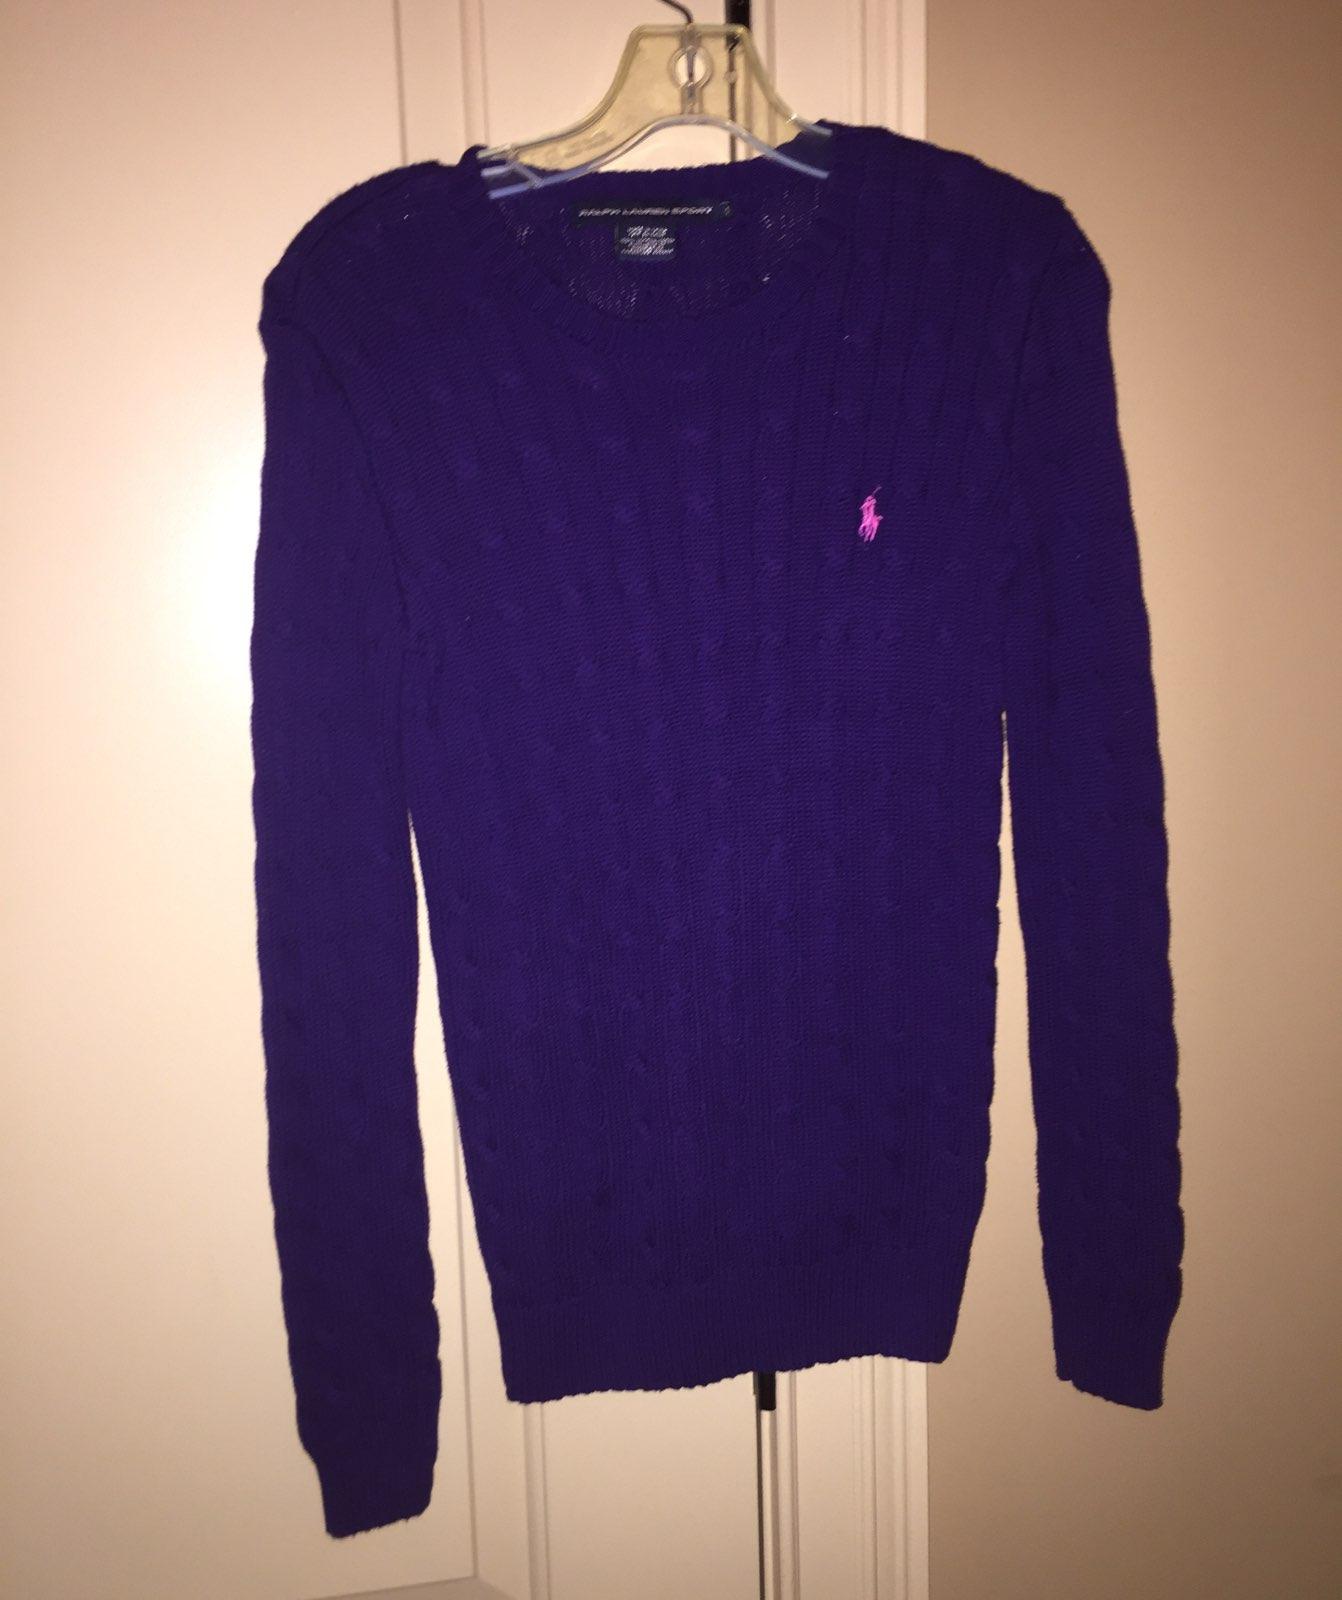 Royal Purple Ralph Lauren Polo Sweater - Mercari: BUY & SELL ...